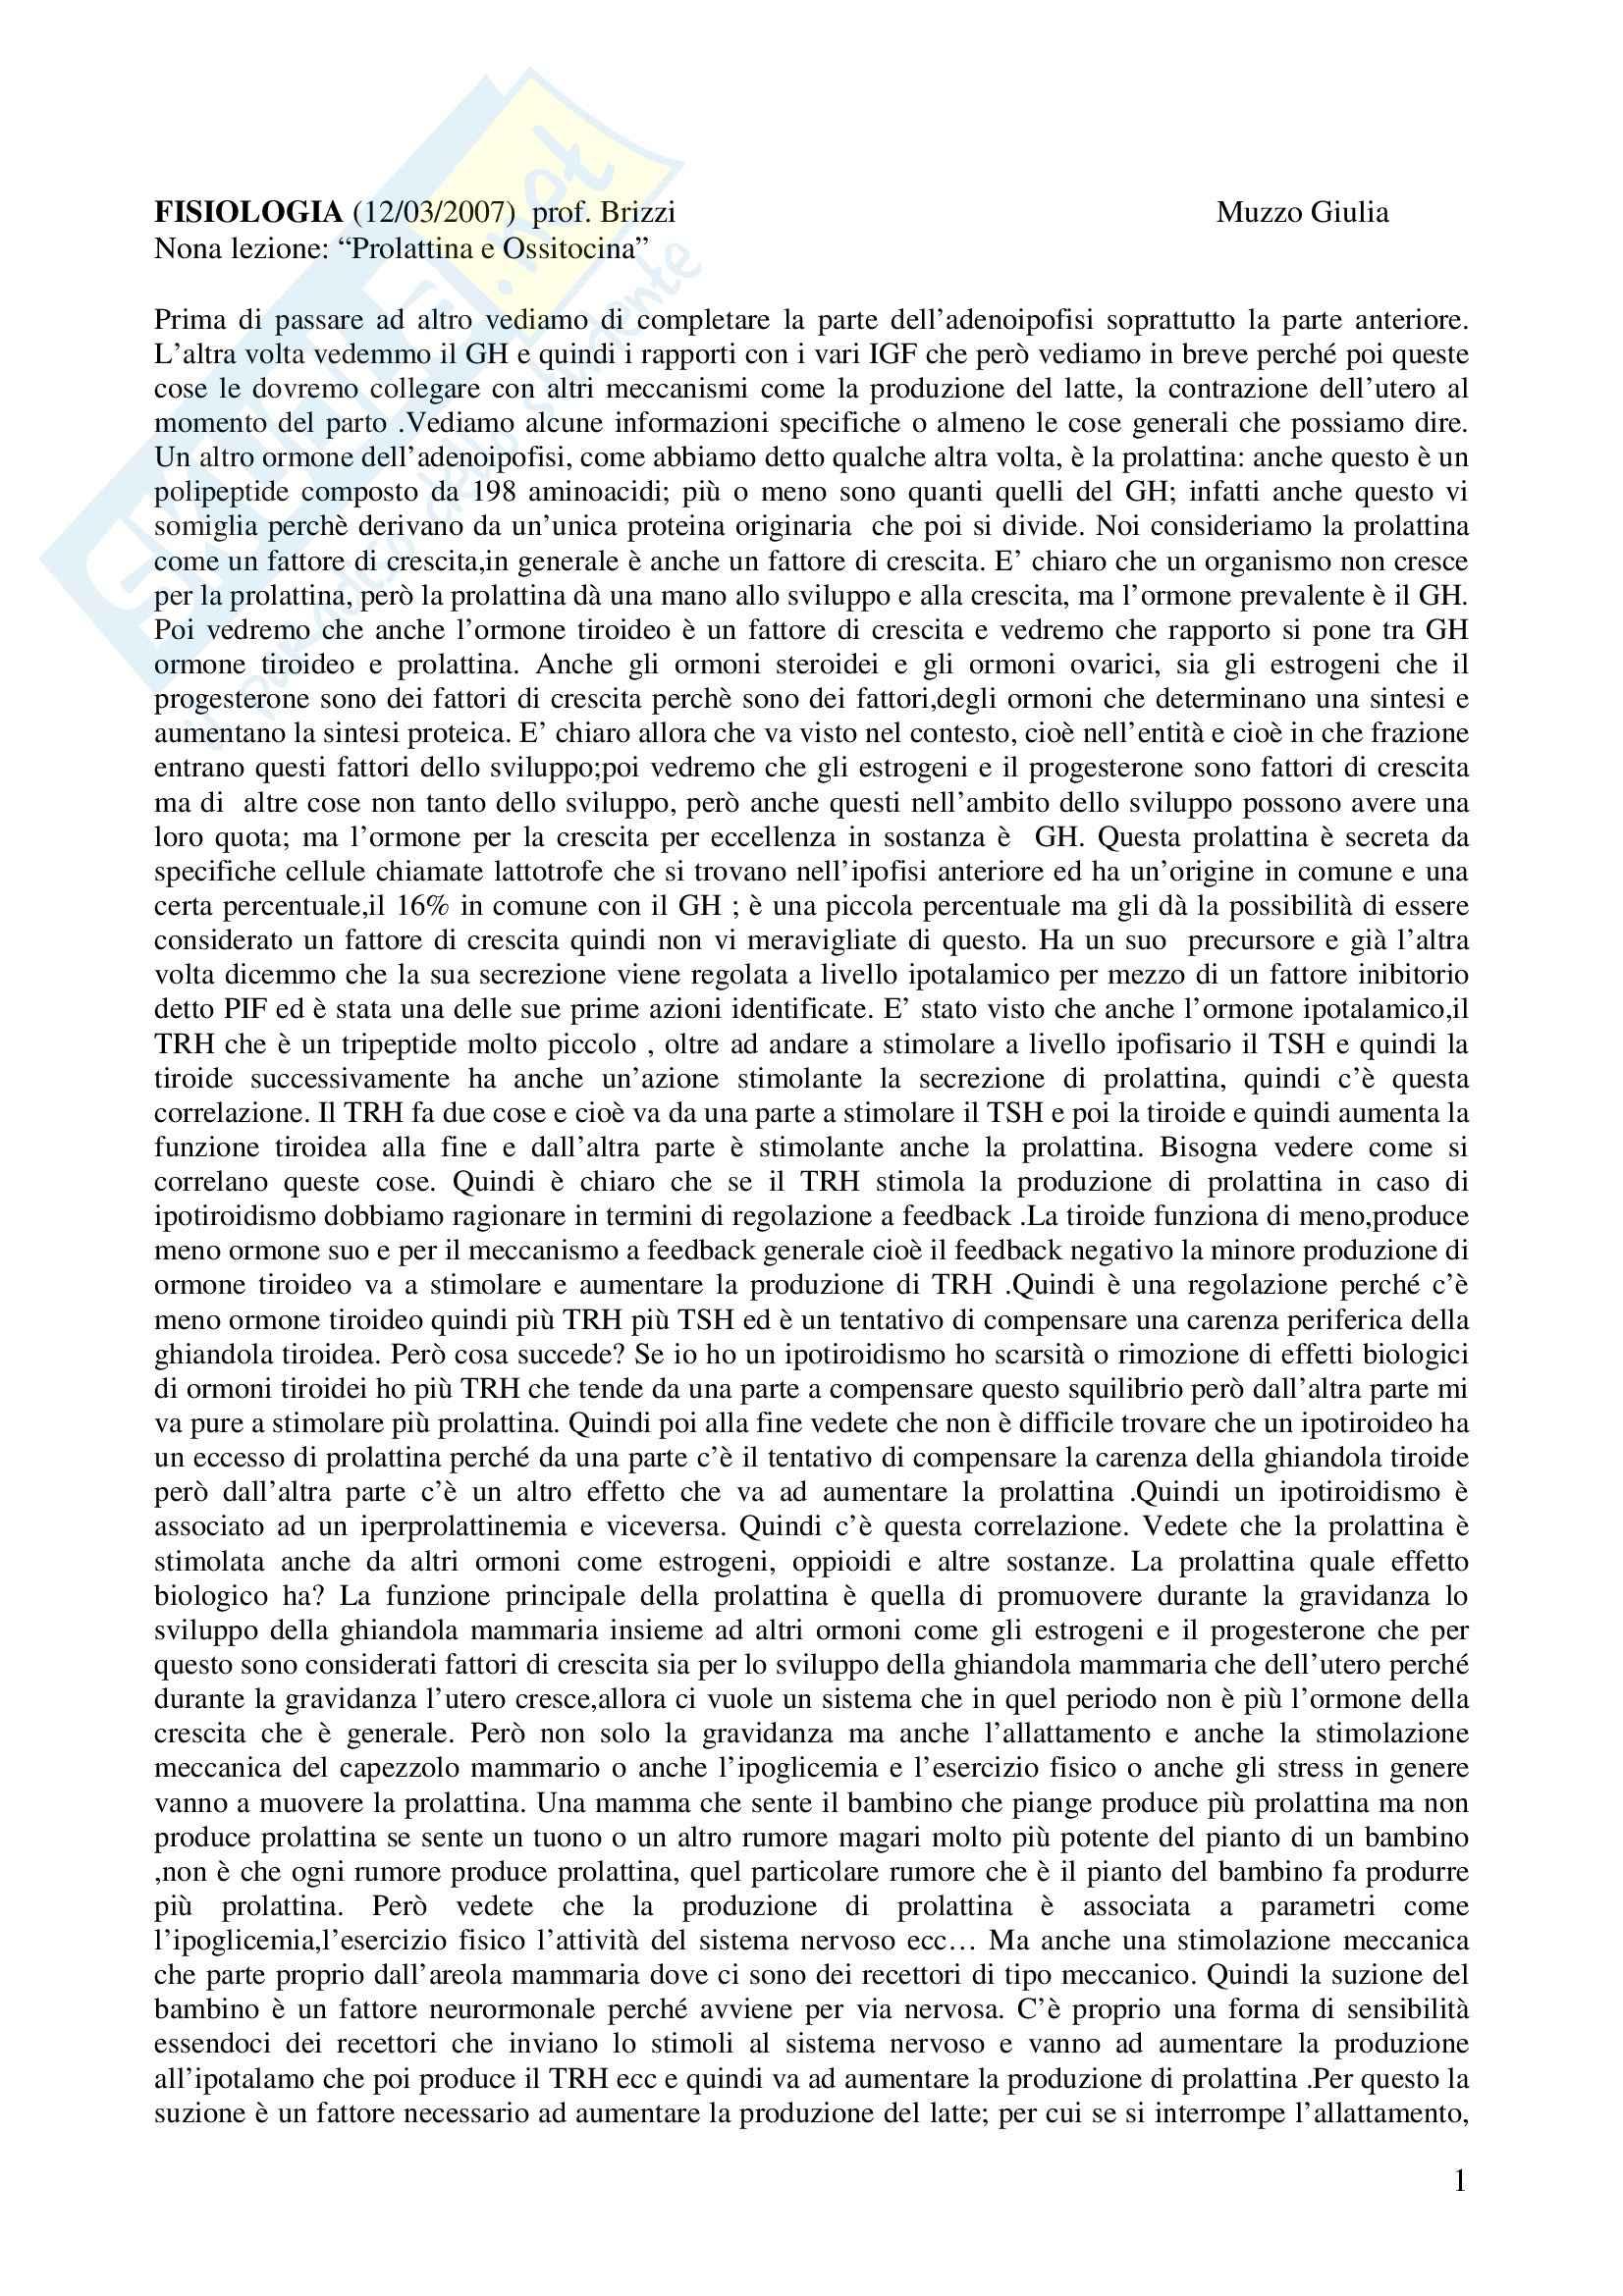 Fisiologia e biofisica - prolattina e ossitocina